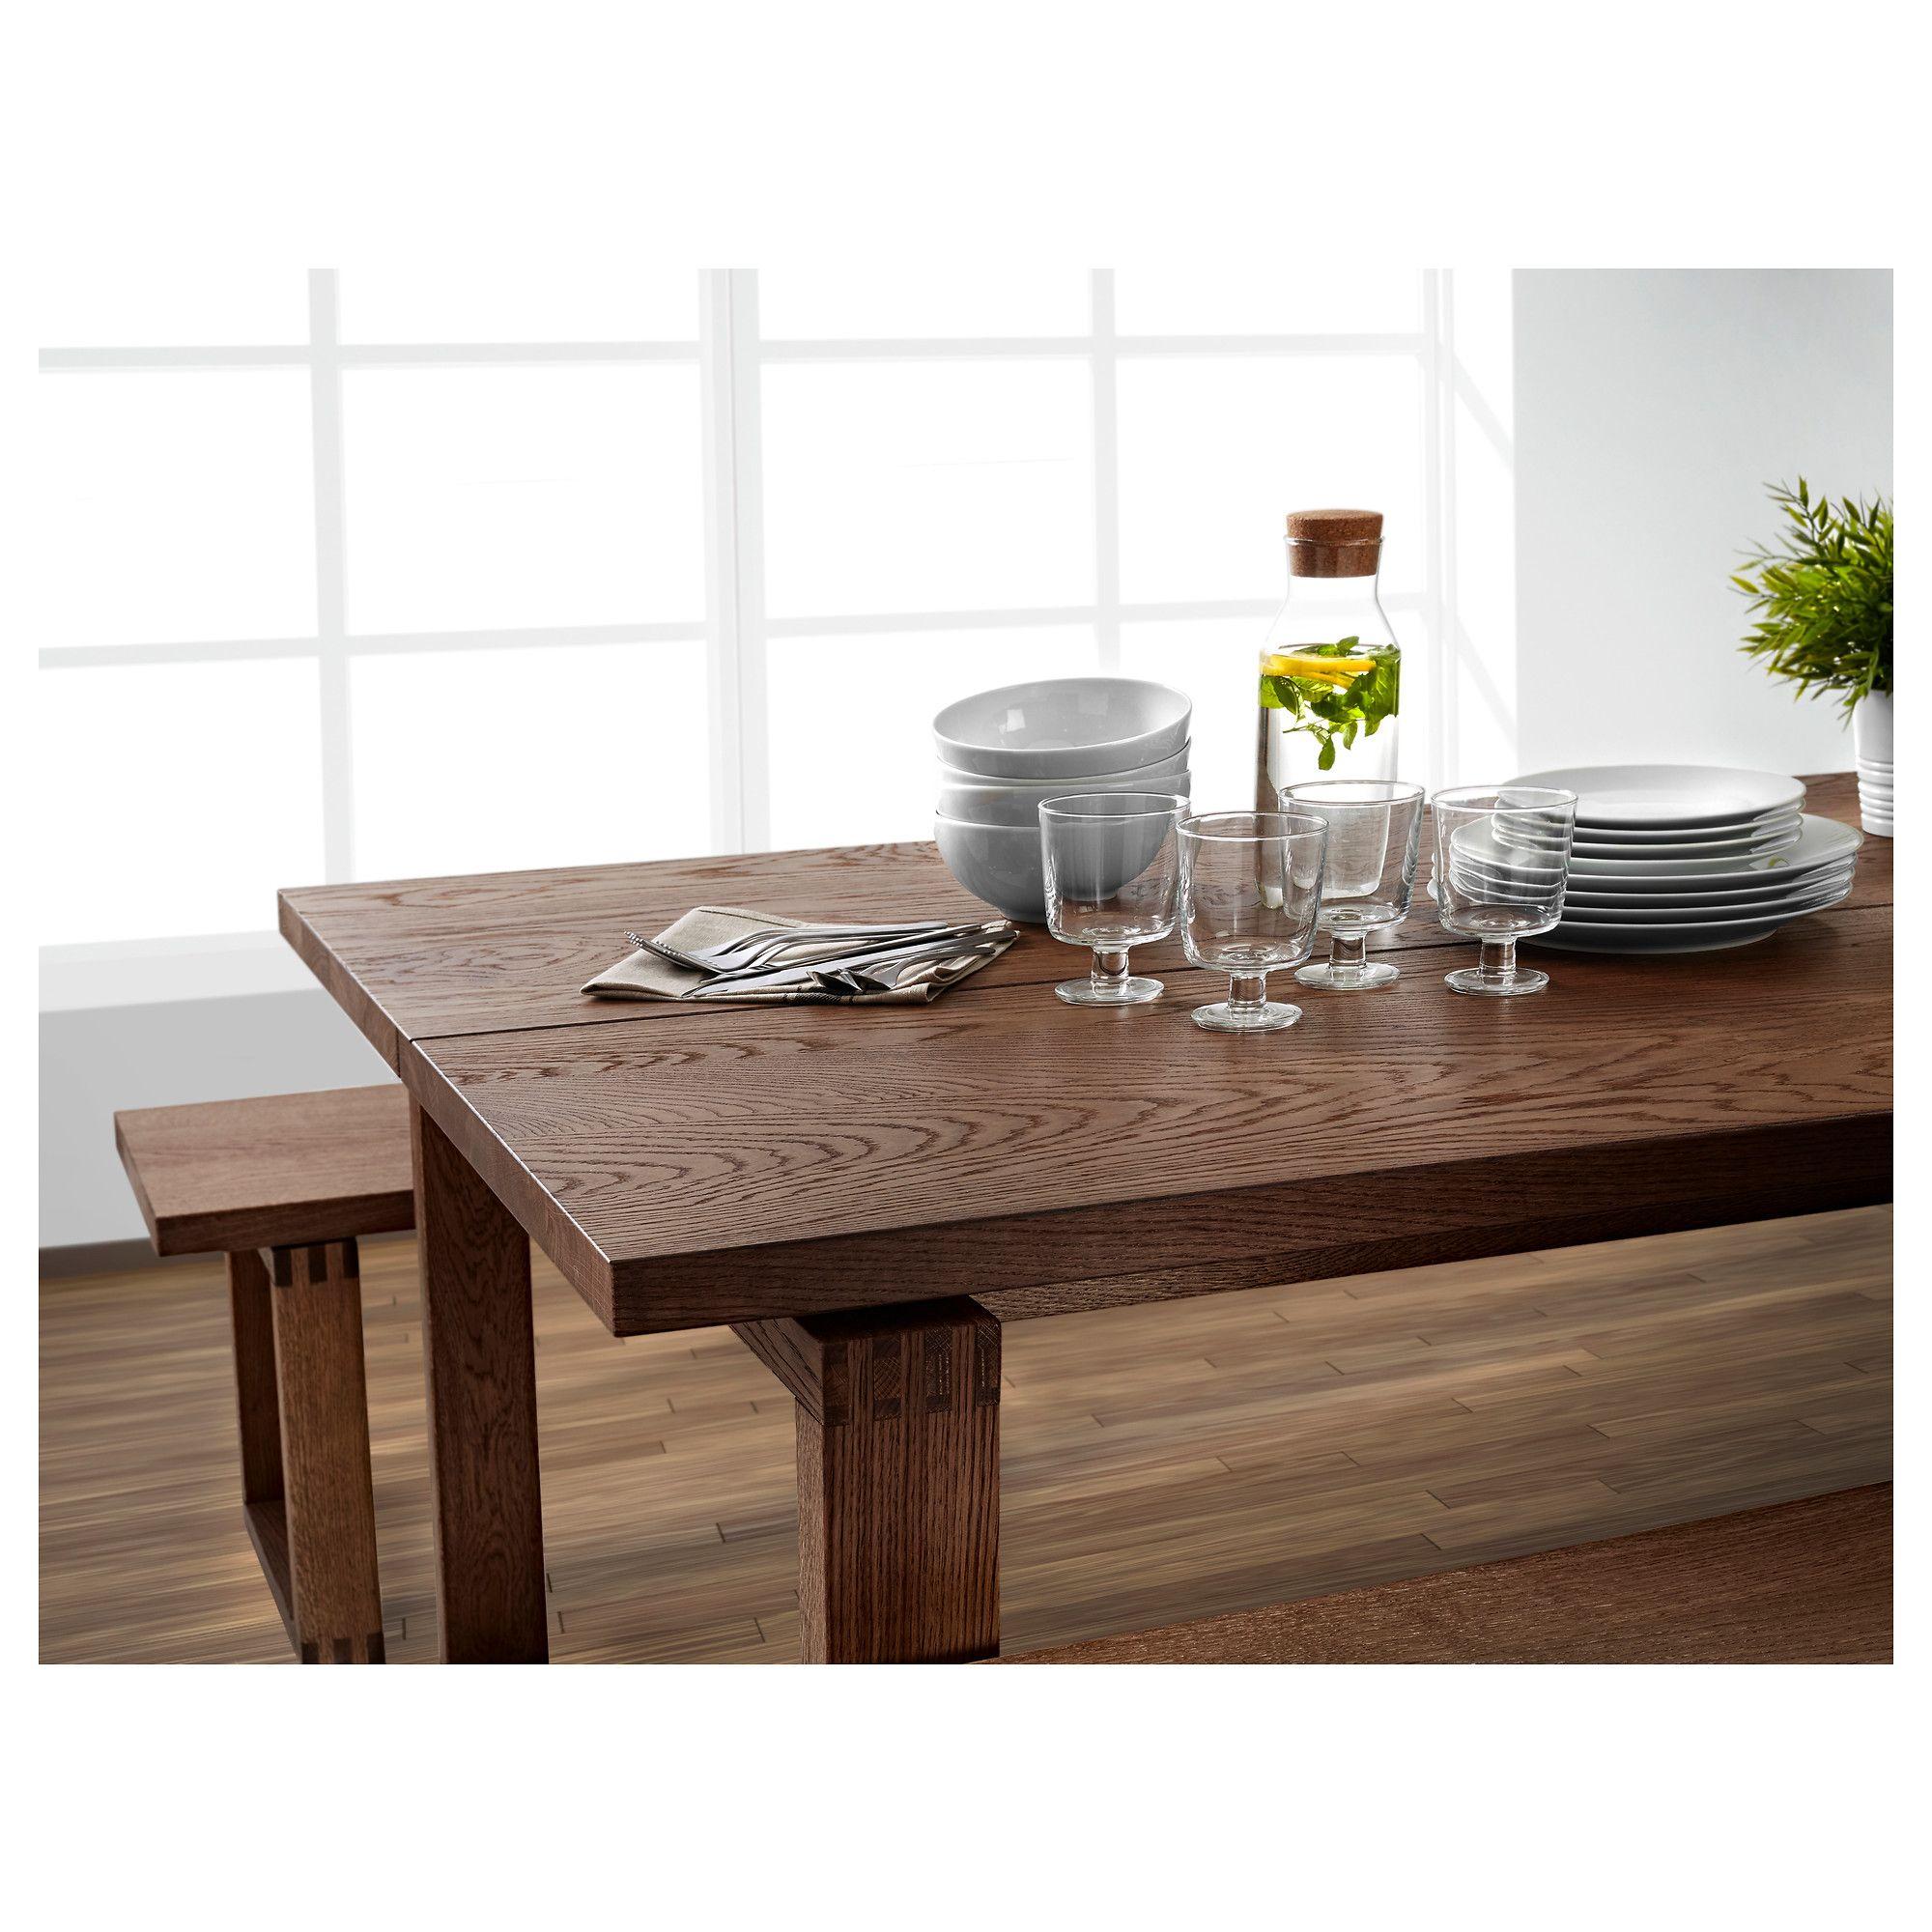 Ikea mörbylånga table oak veneer brown